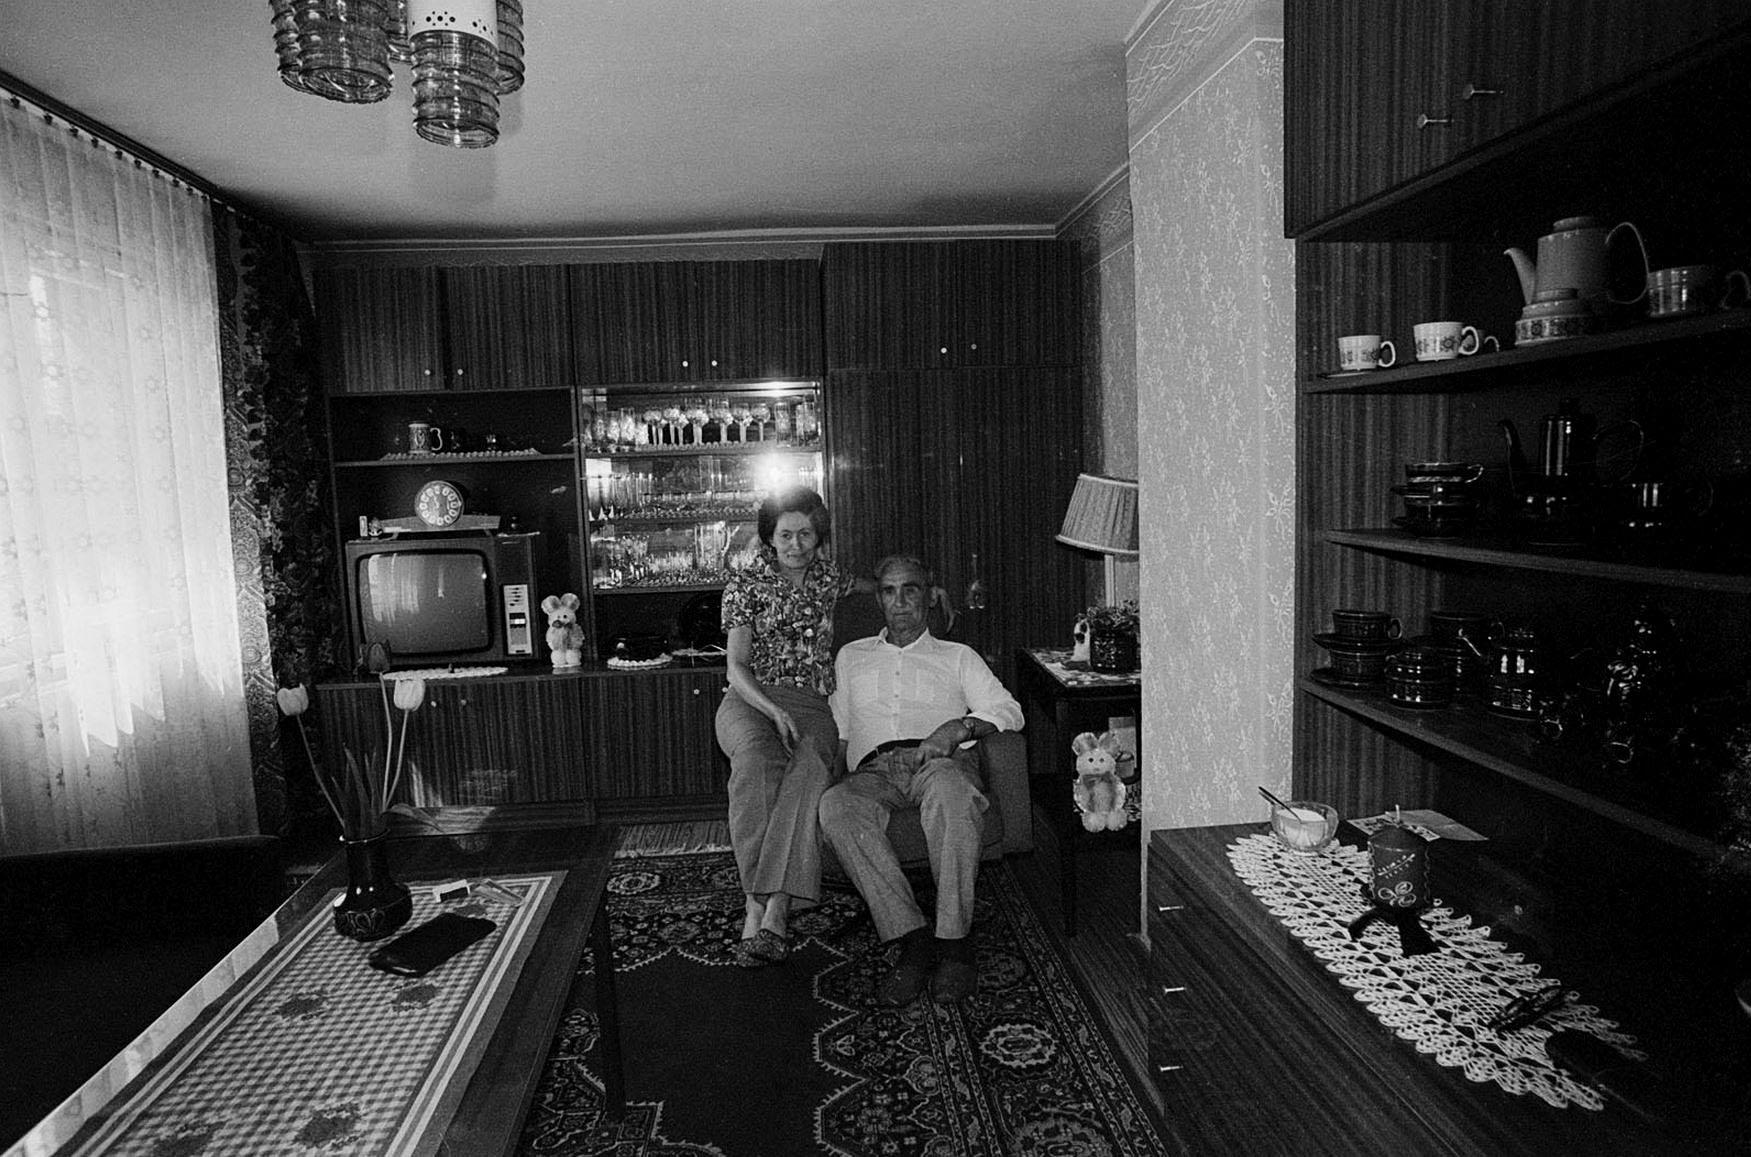 fotoblog-foto-blog-zofia-rydet-wystawa-zapis-socjologiczny-3